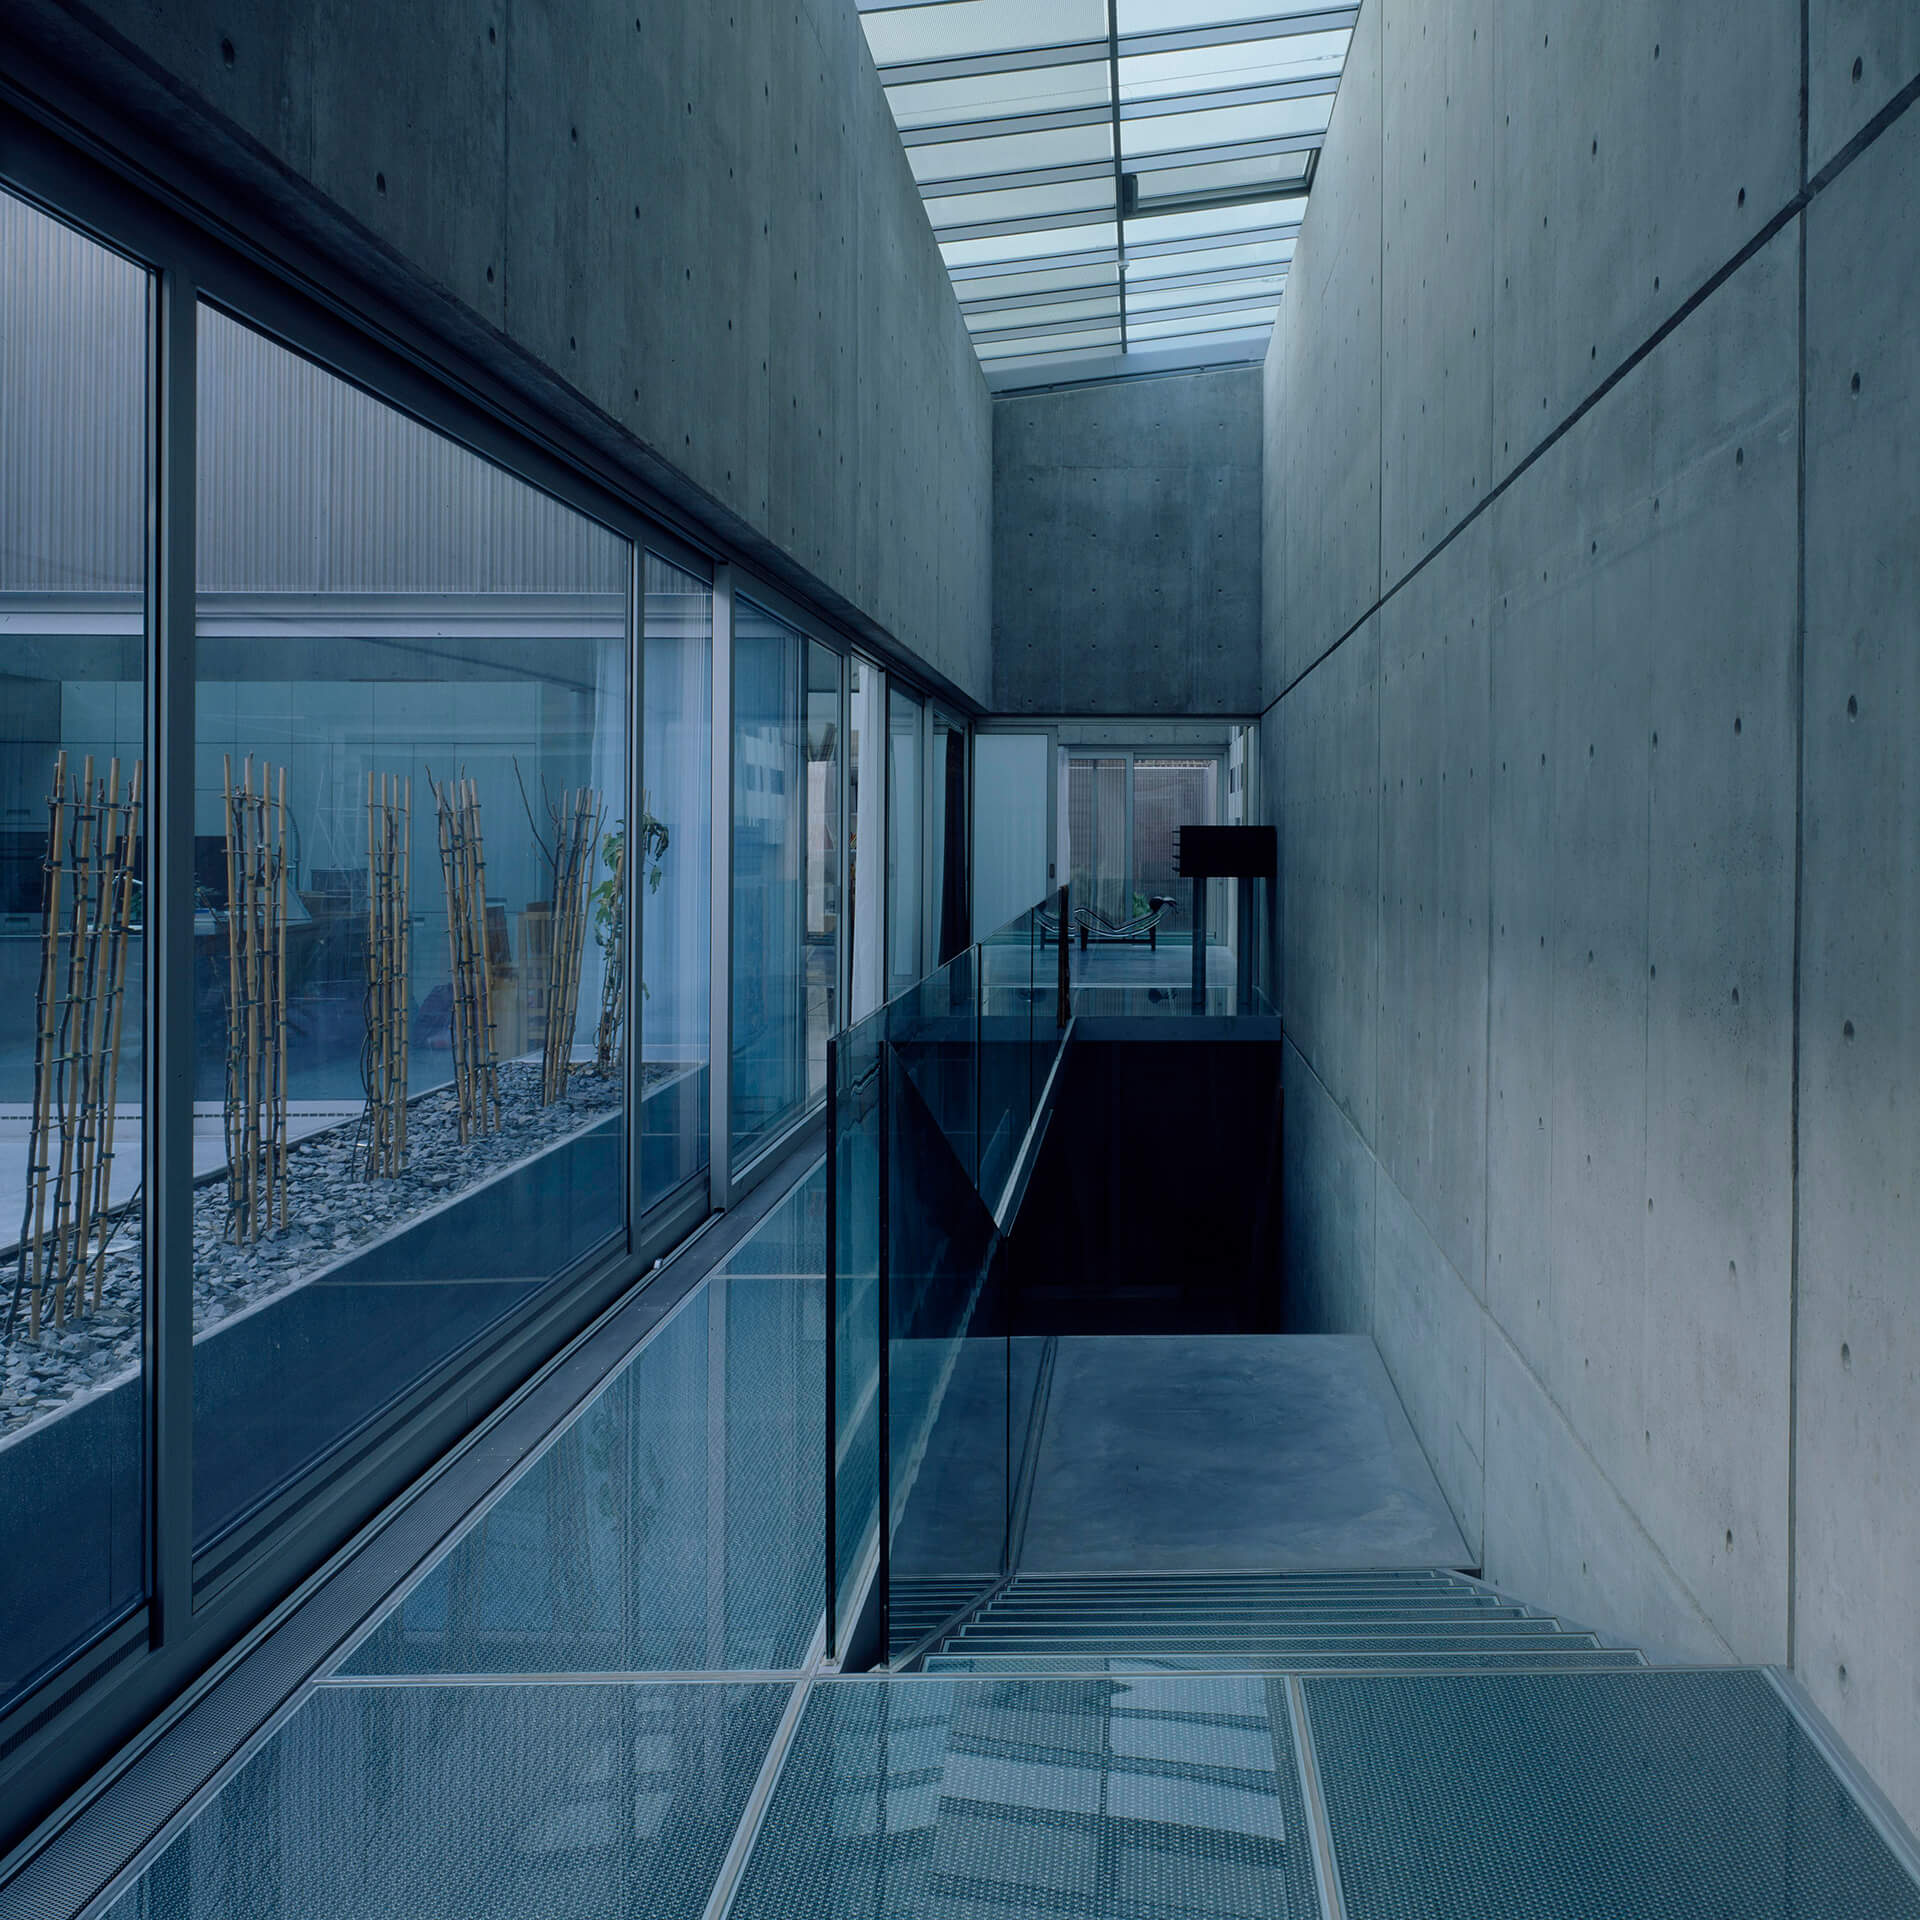 Priory of the Assumption corridor